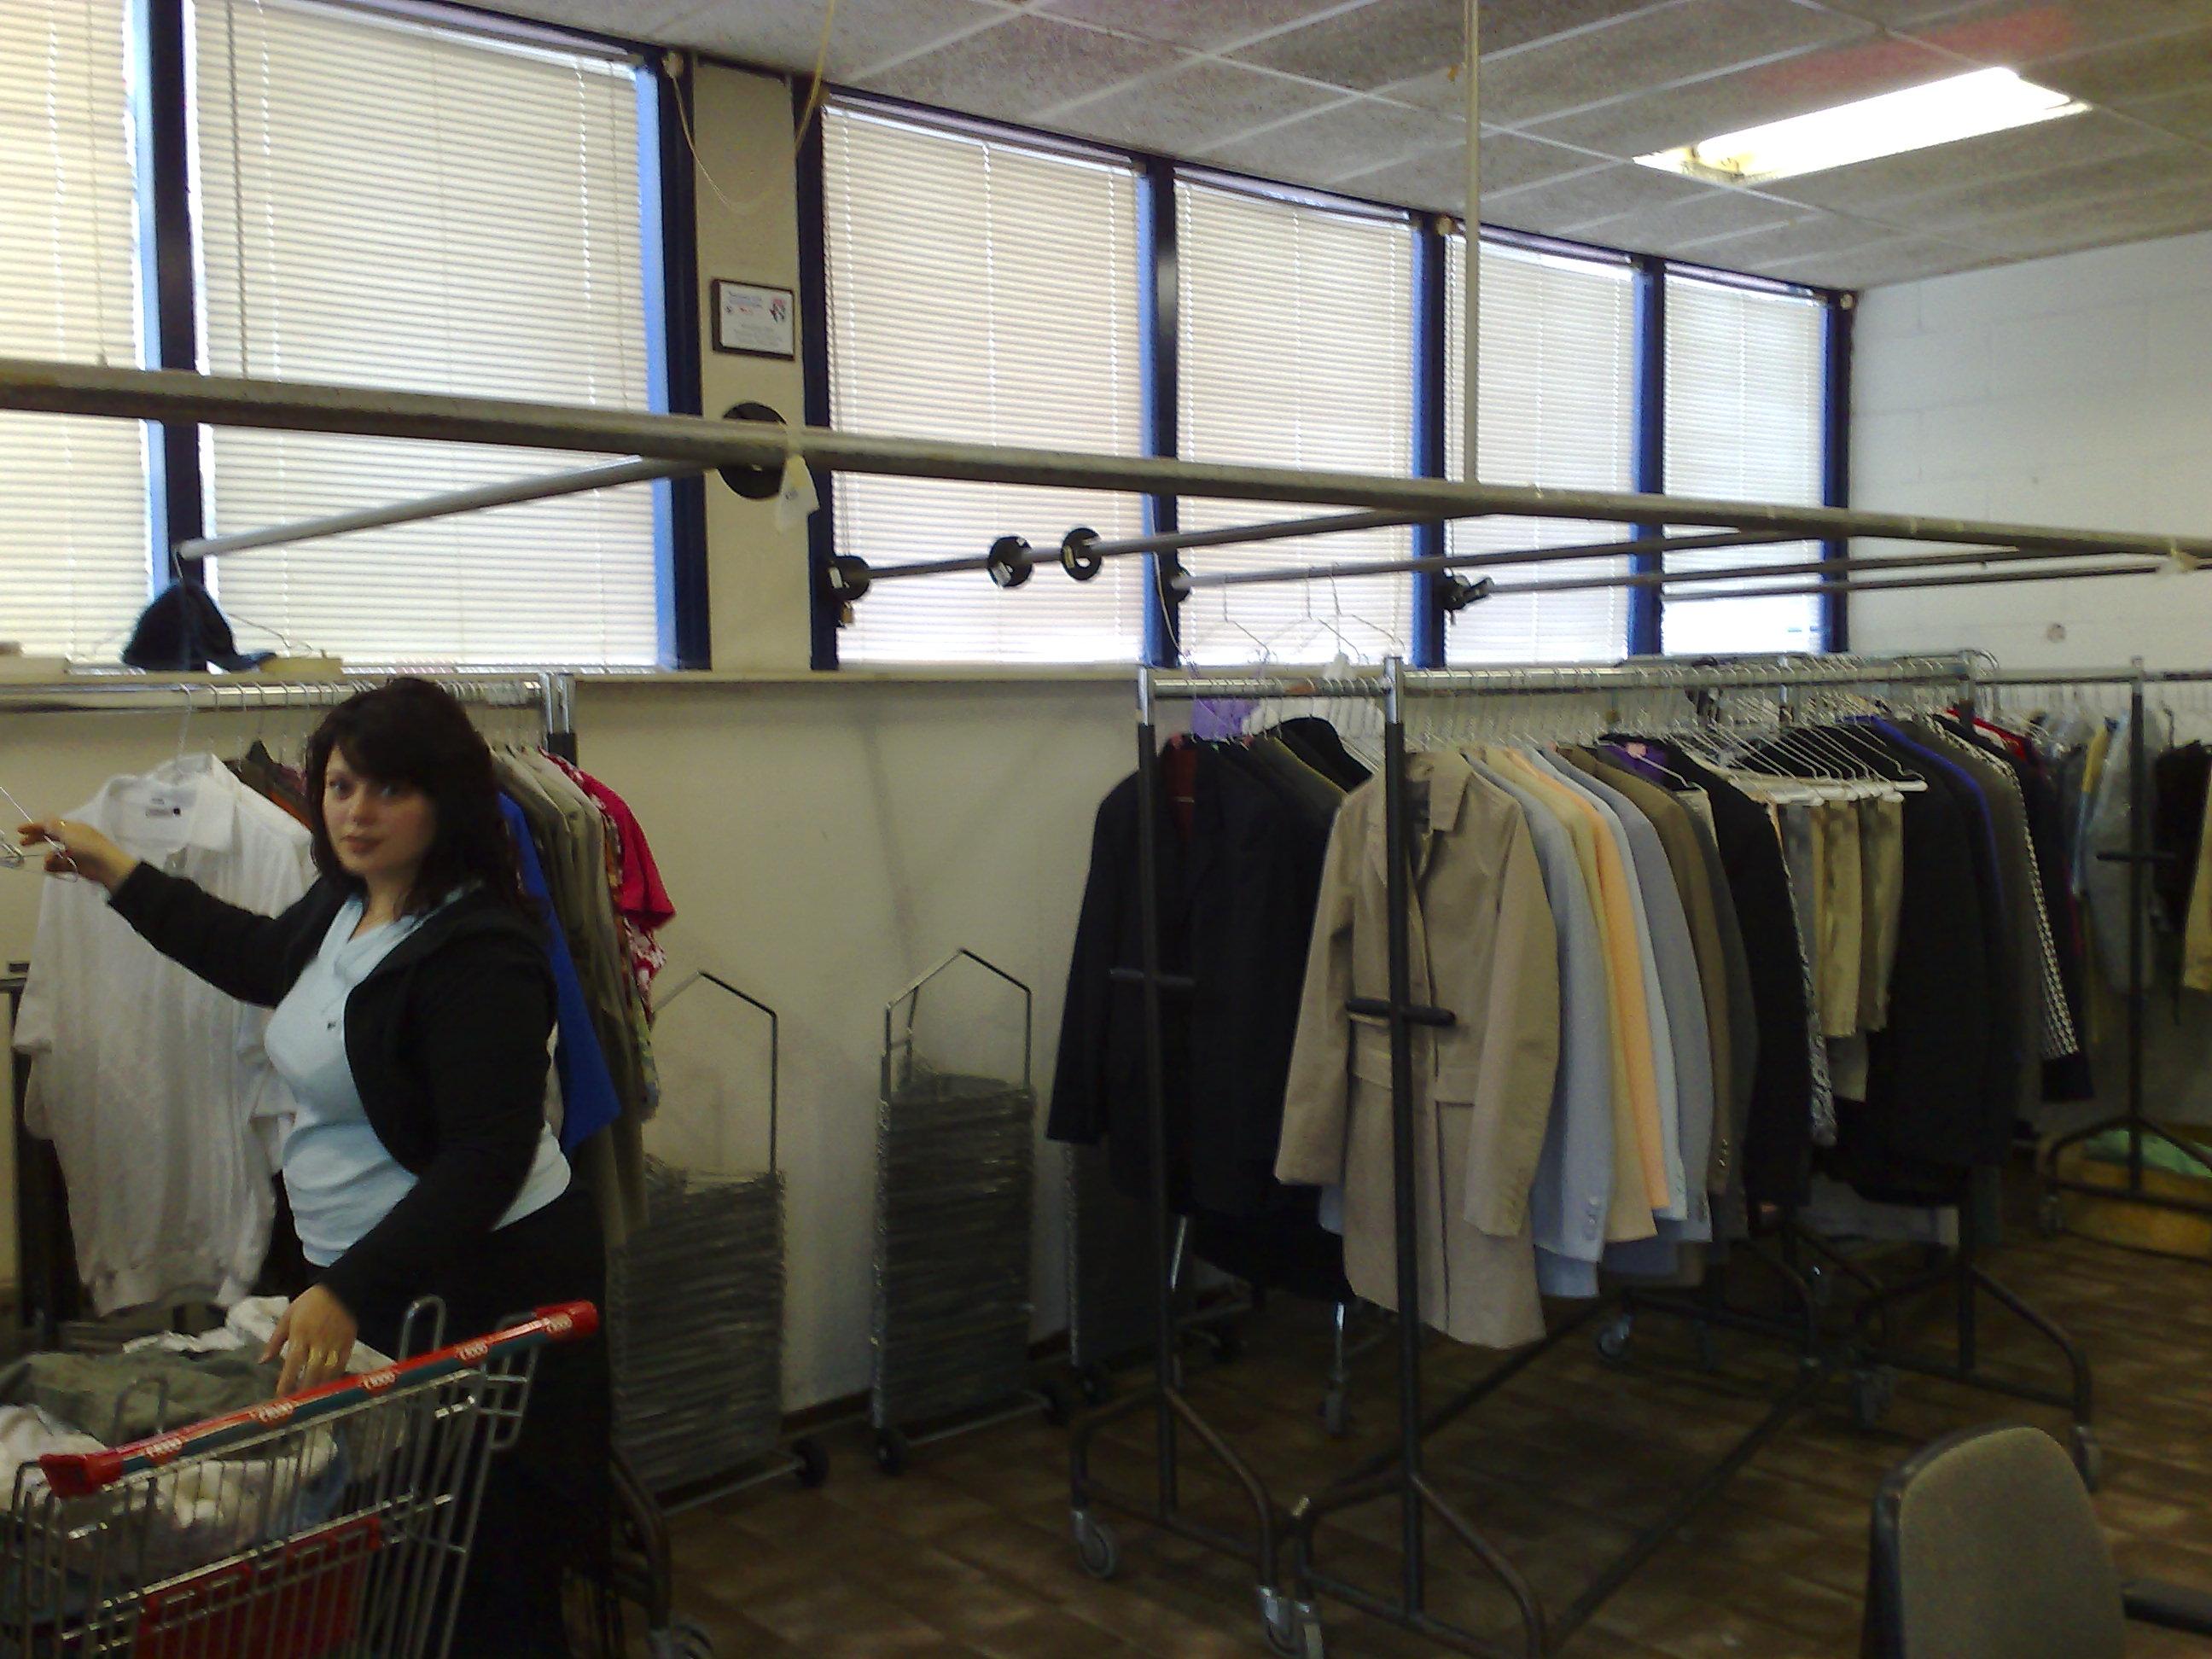 Selectie van kleding